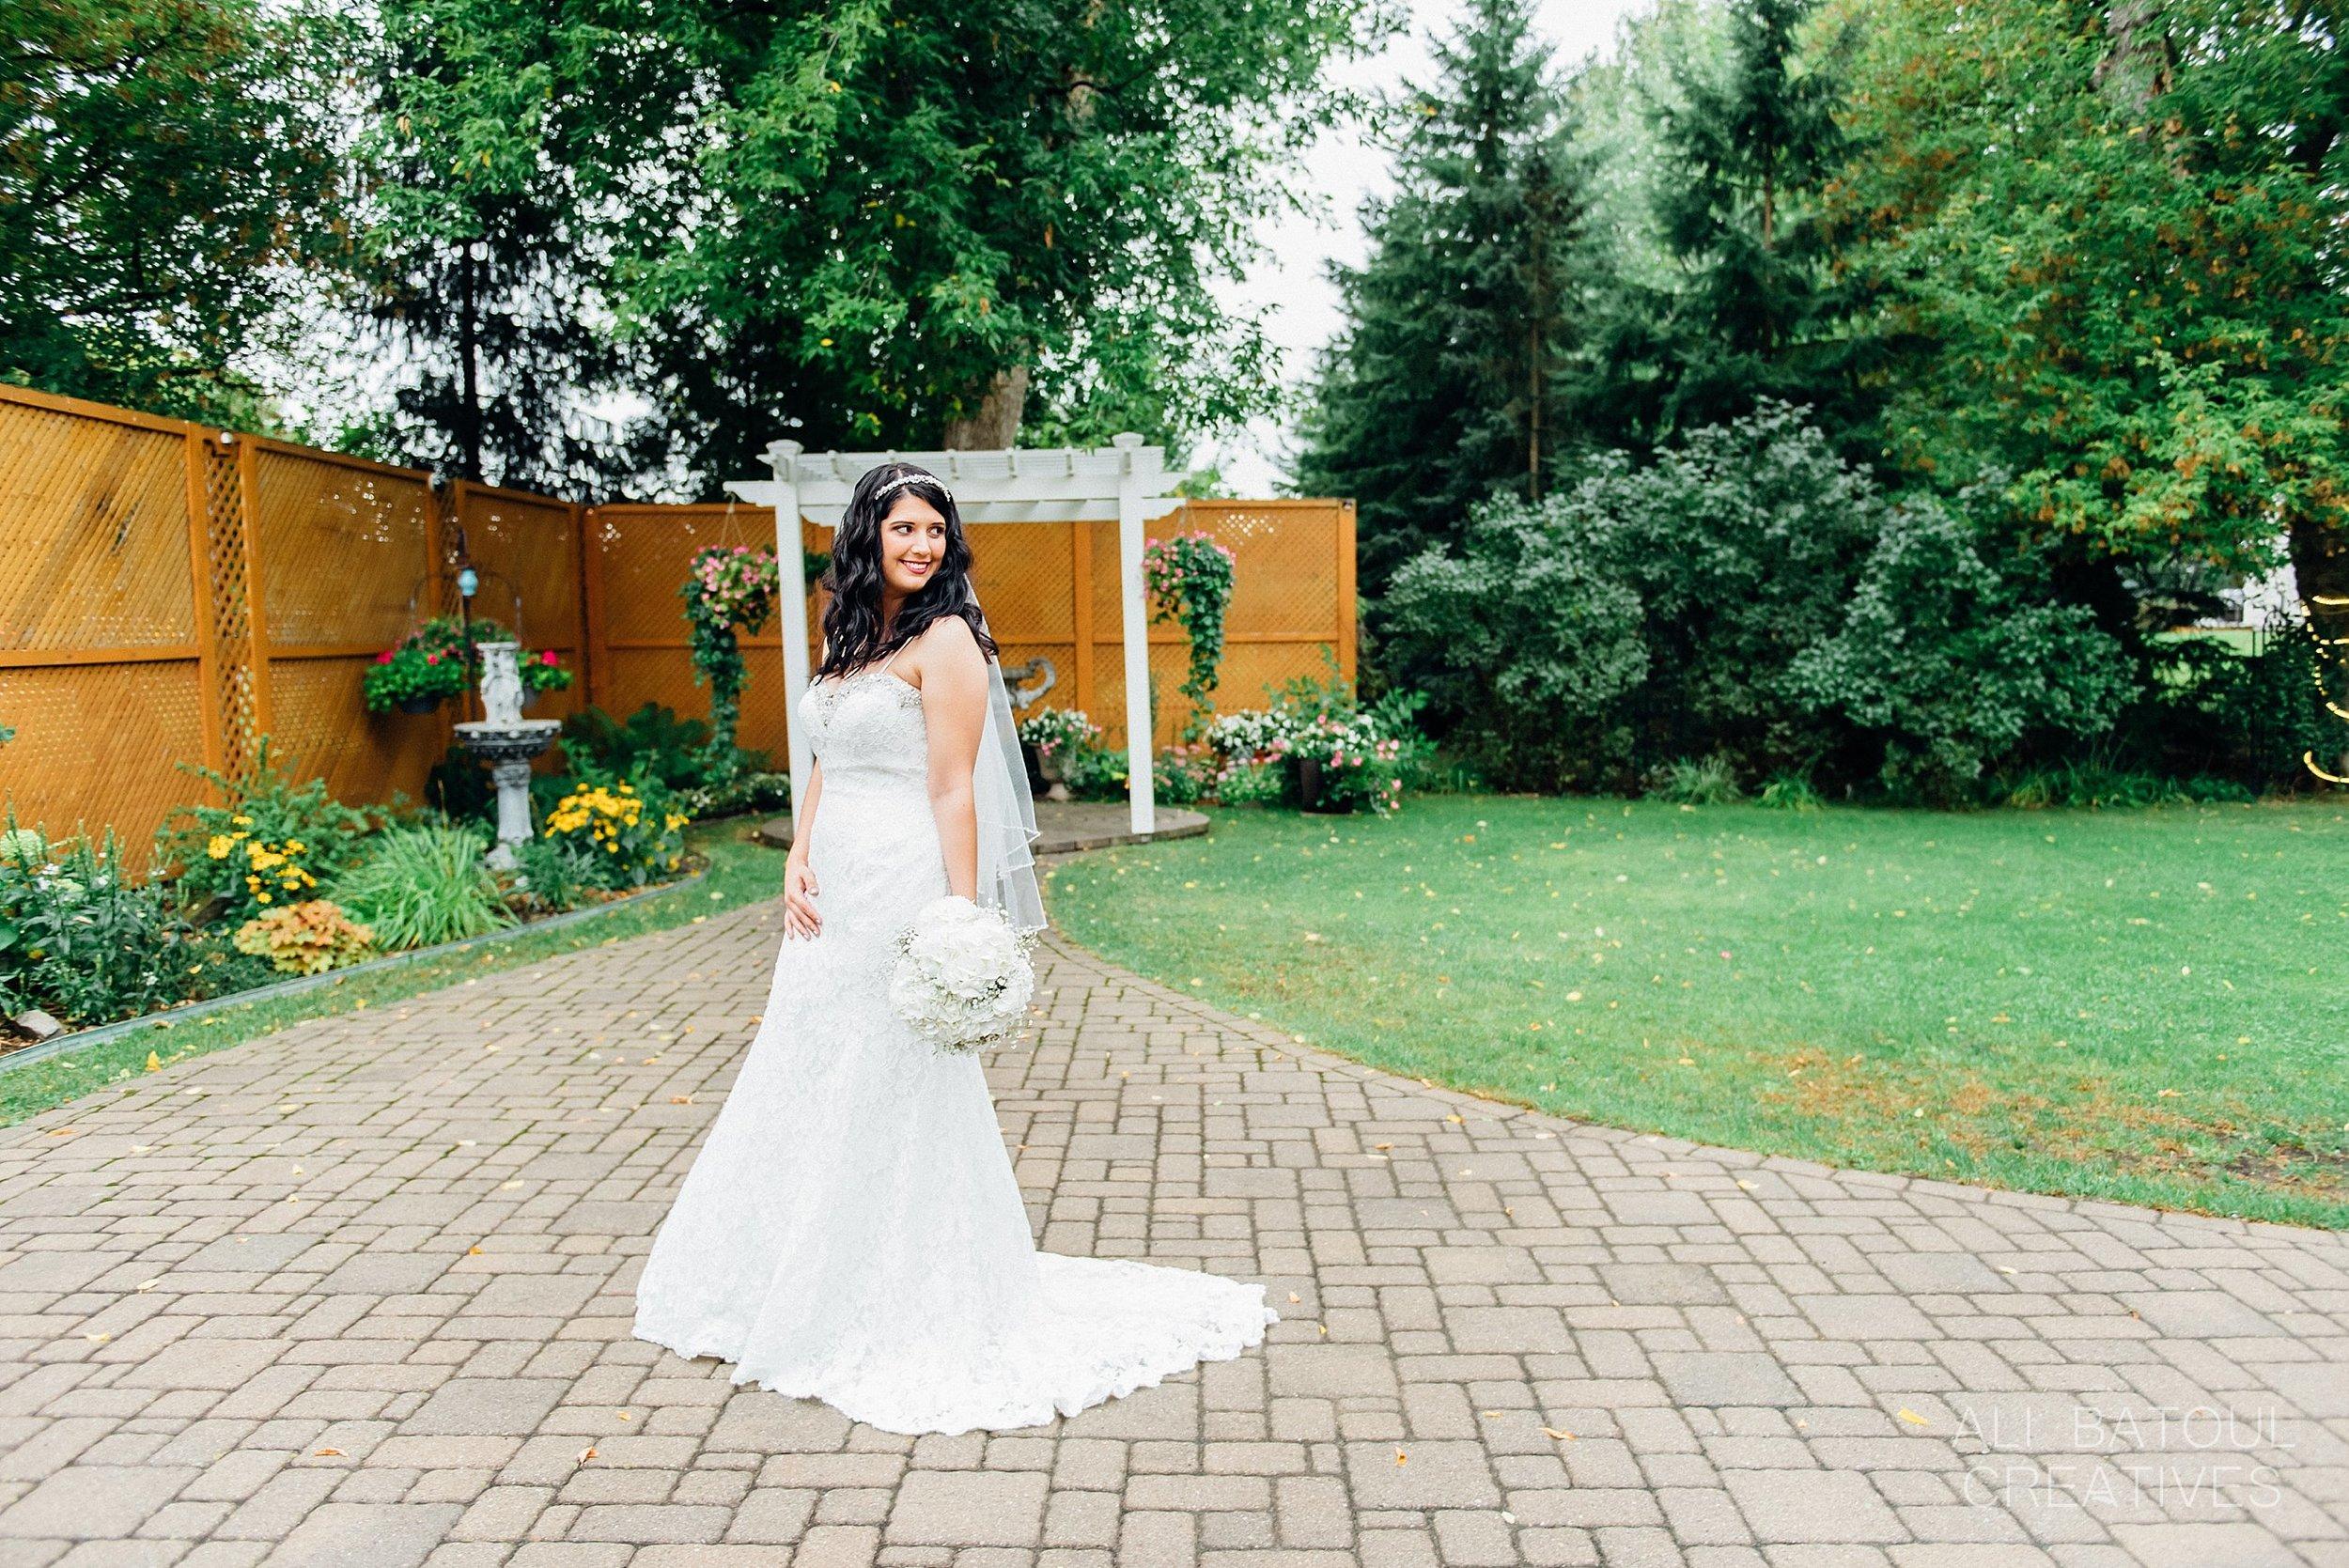 Jocelyn + Steve At The Schoolhouse Wedding - Ali and Batoul Fine Art Wedding Photography_0023.jpg